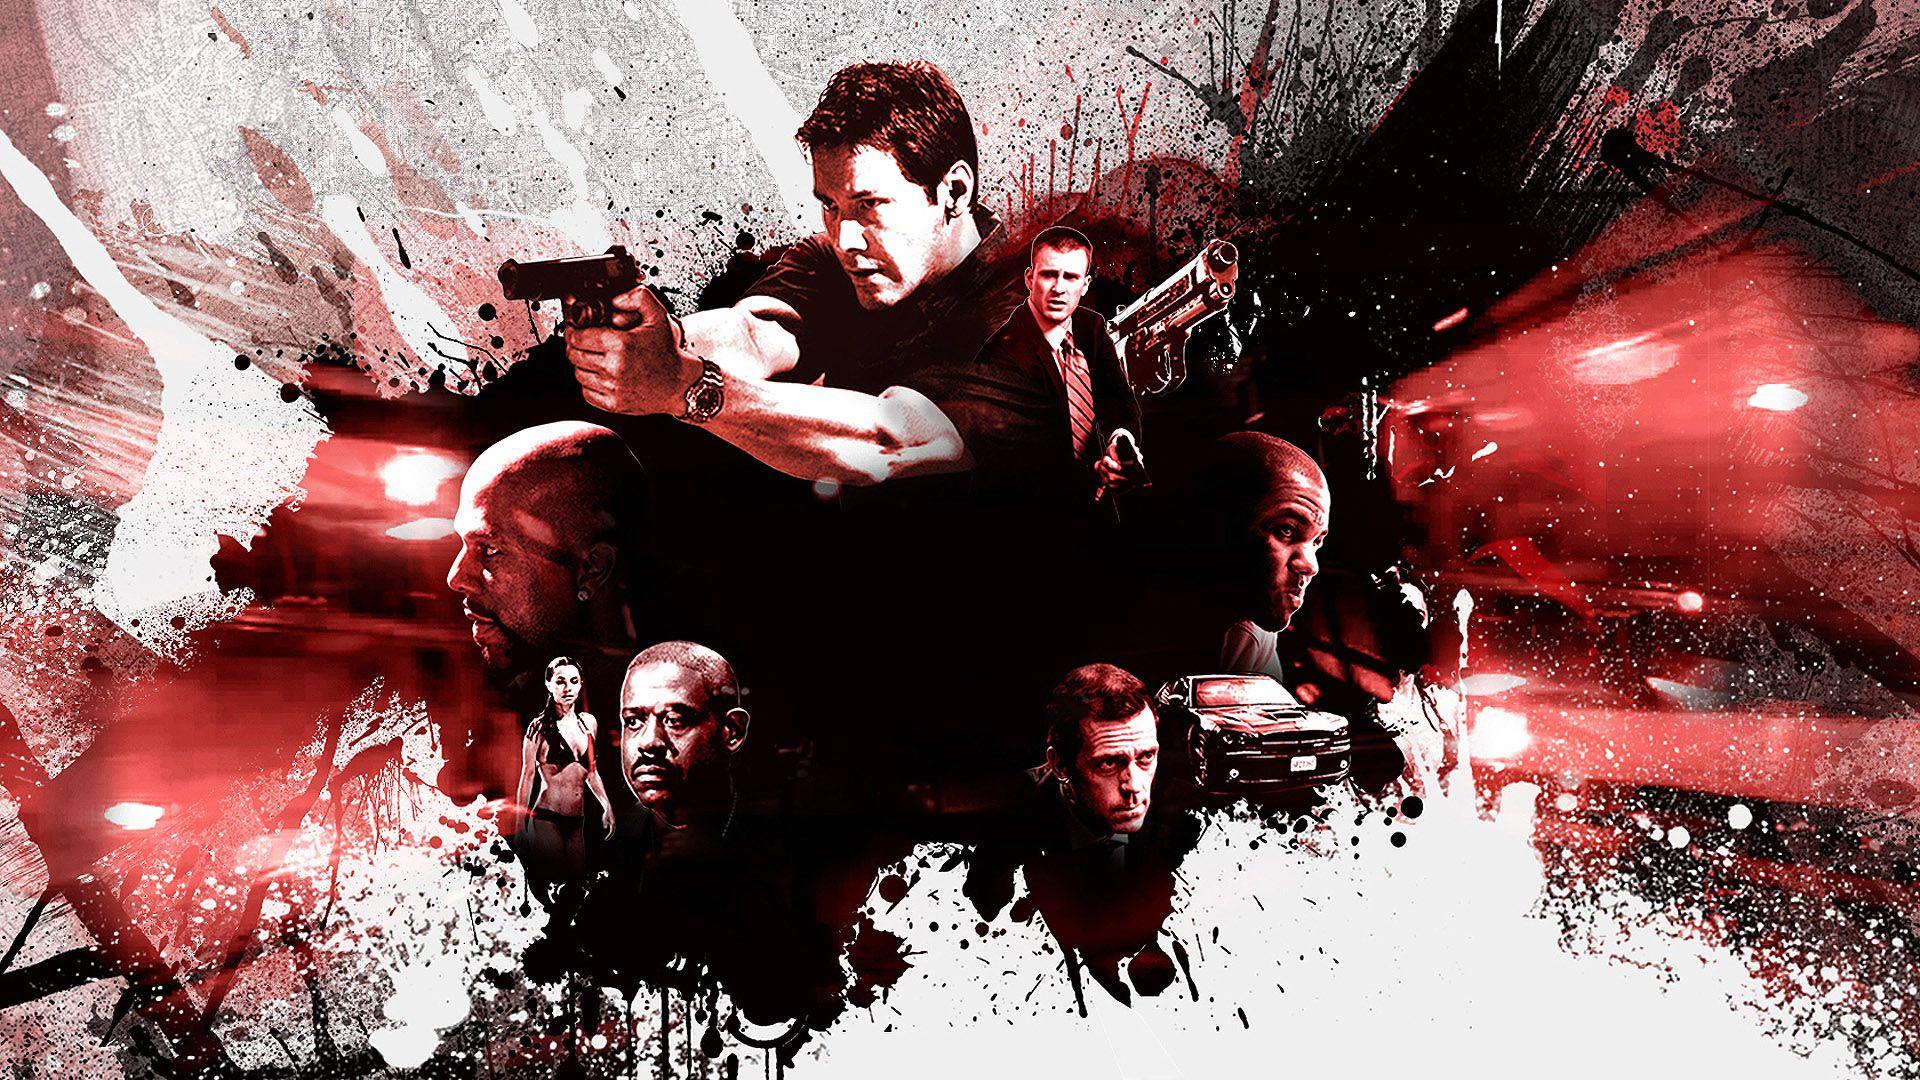 Street Kings: Movie Trailers, Cast, Ratings, Similar ...